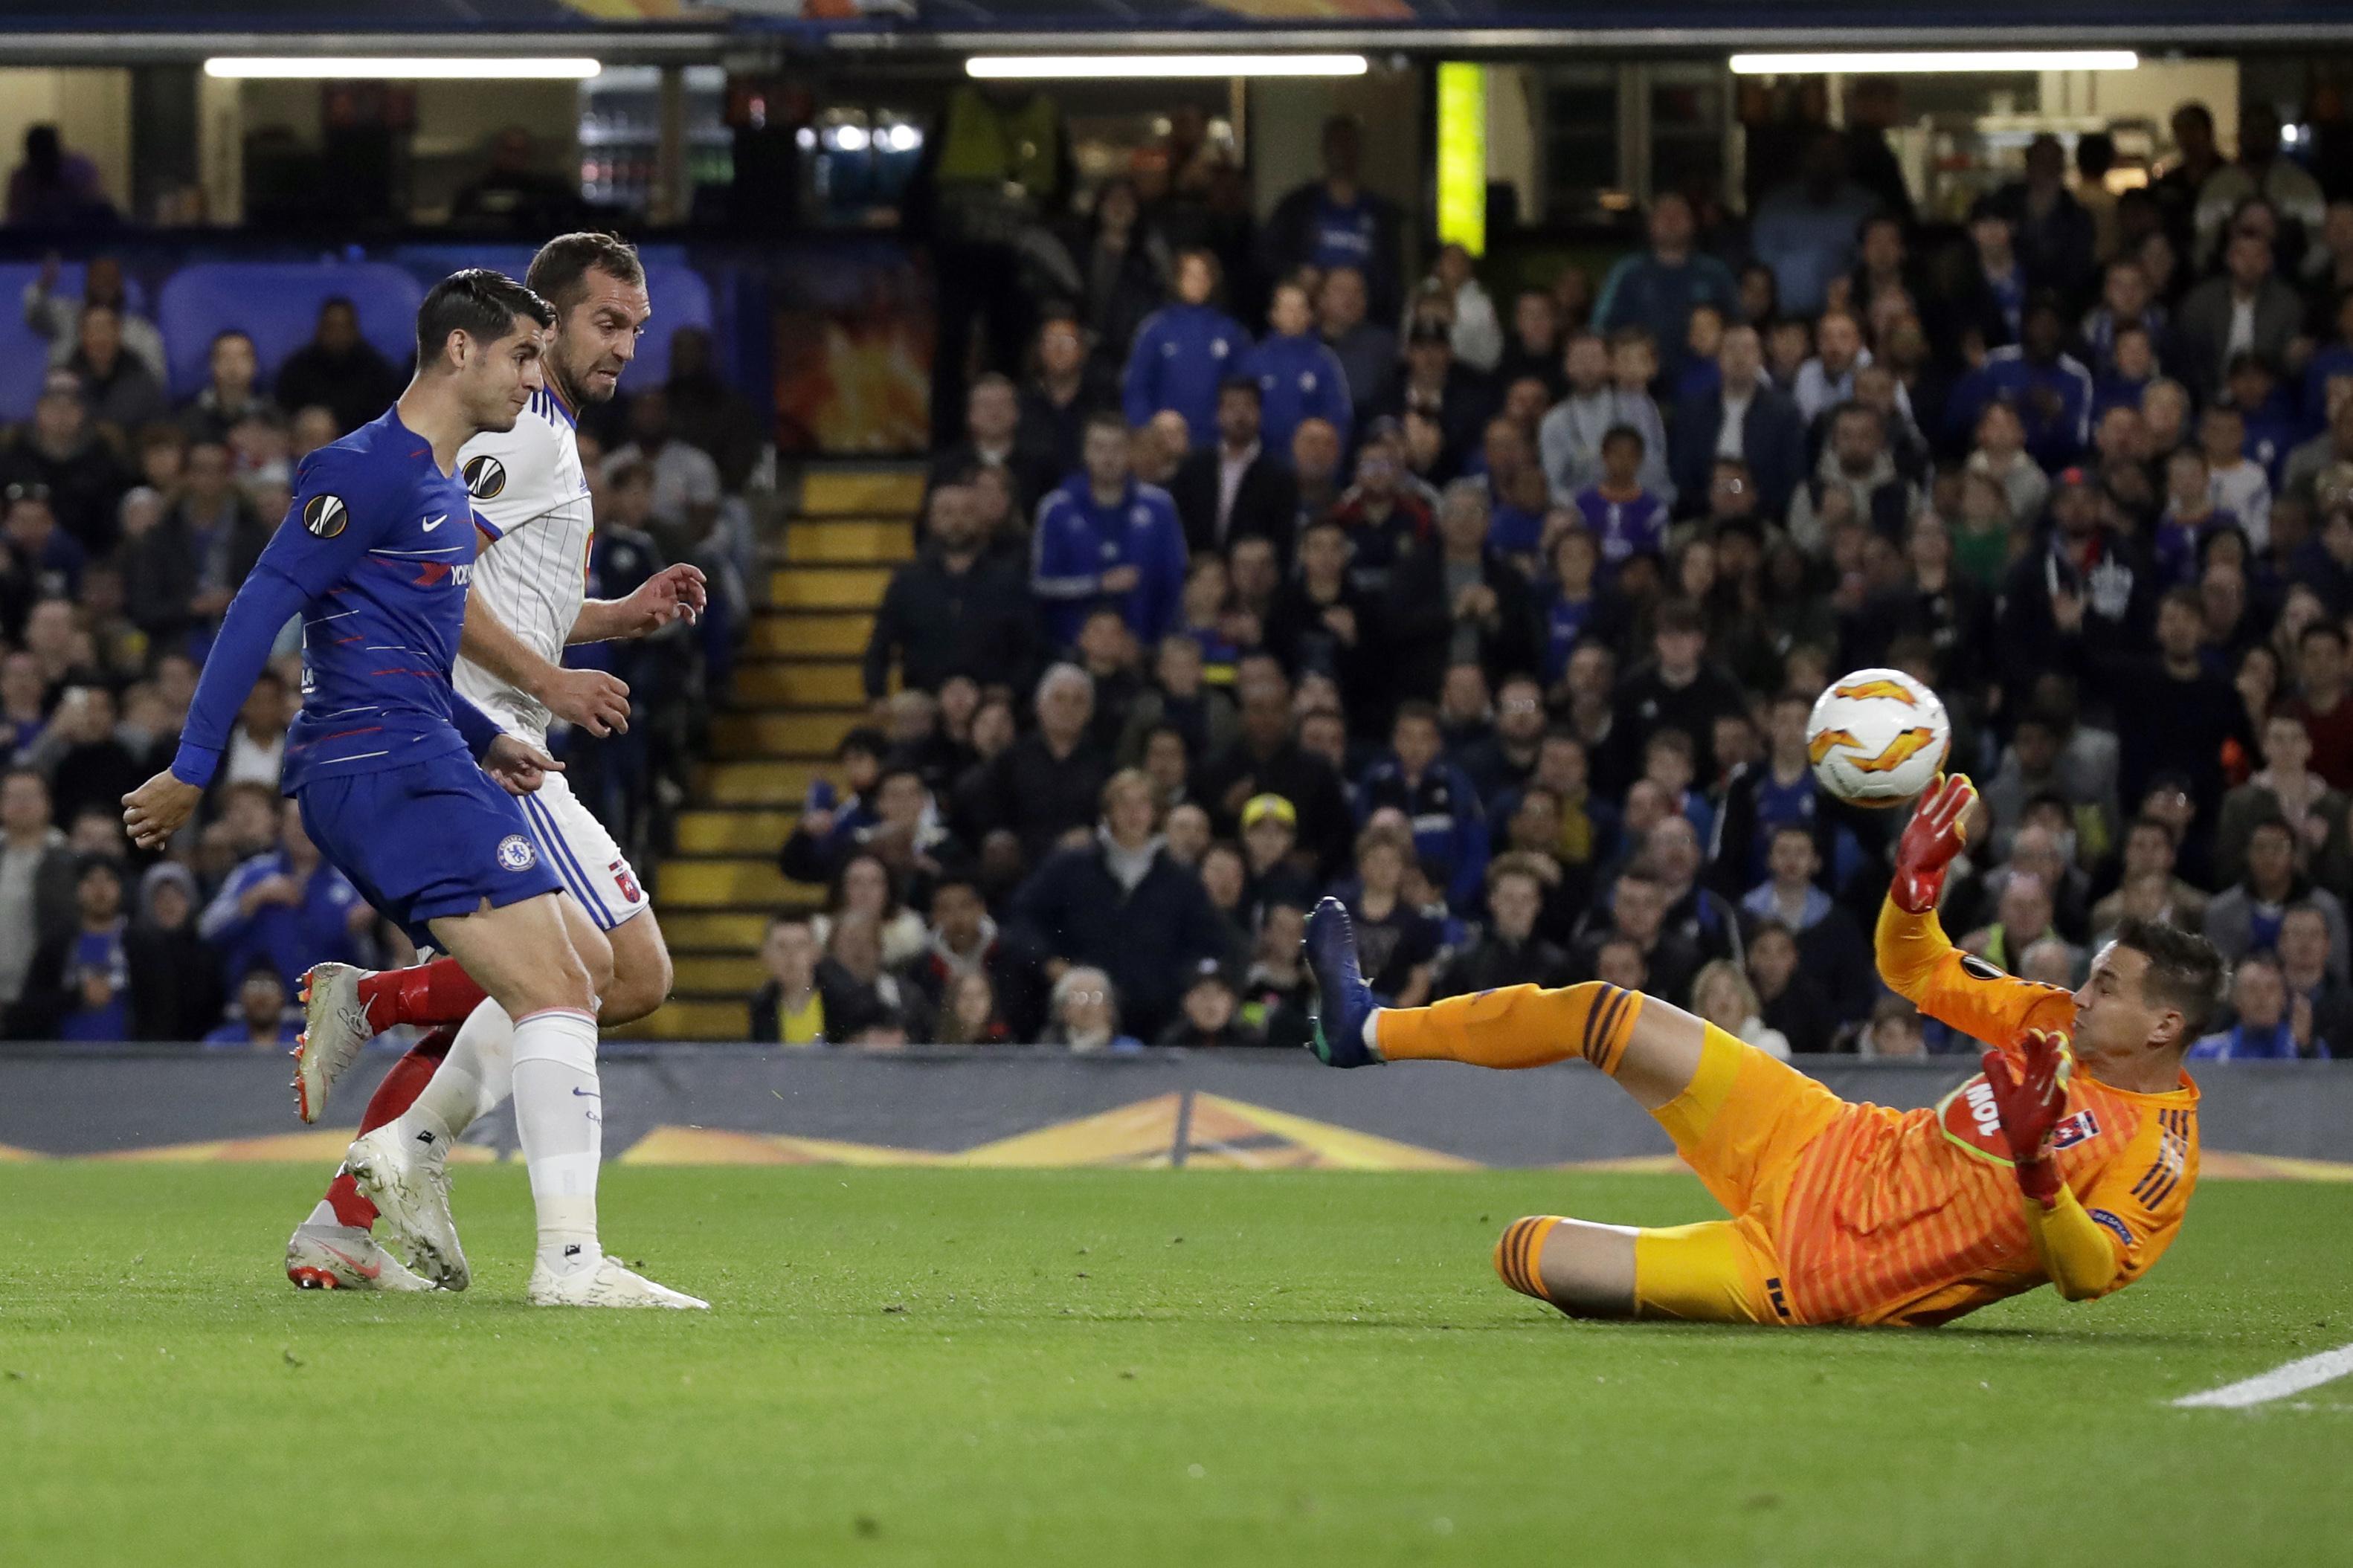 Alvaro Morata missed a sitter to fire Chelsea ahead